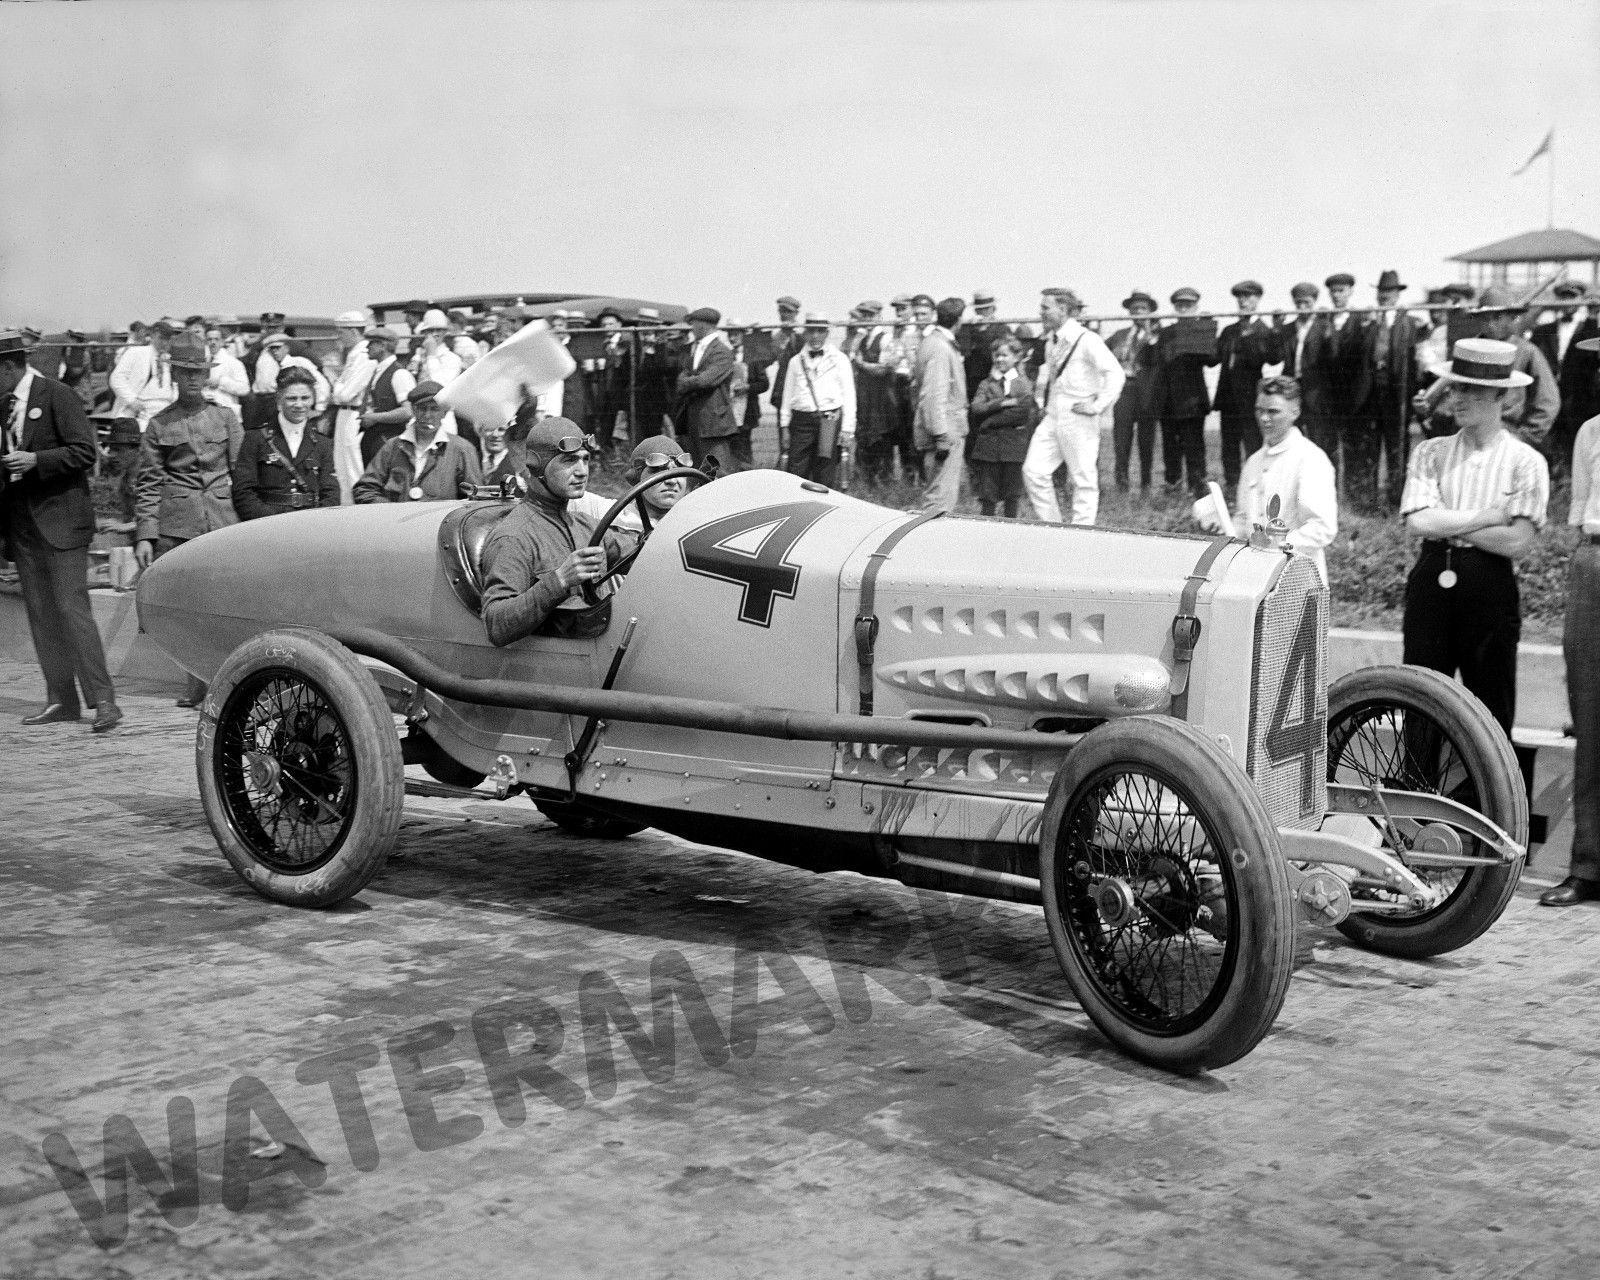 Photograph Vintage Image Indy Packard Race Car Ralph De Palma